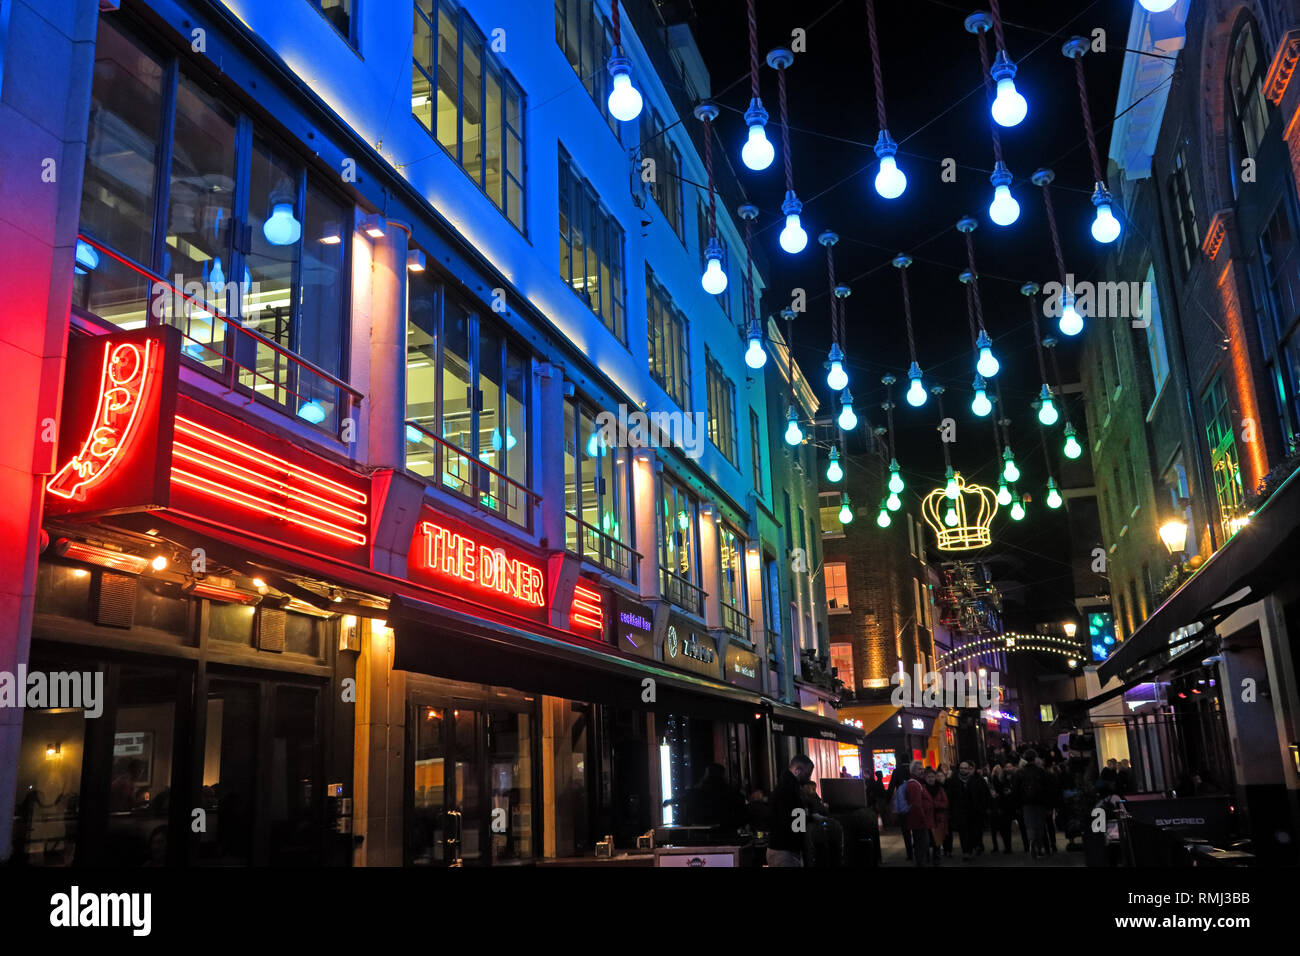 @HotpixUK,HotpixUK,GoTonySmith,England,UK,Neon,lights,sign,advert,advertising,bright,London,SoHo,South